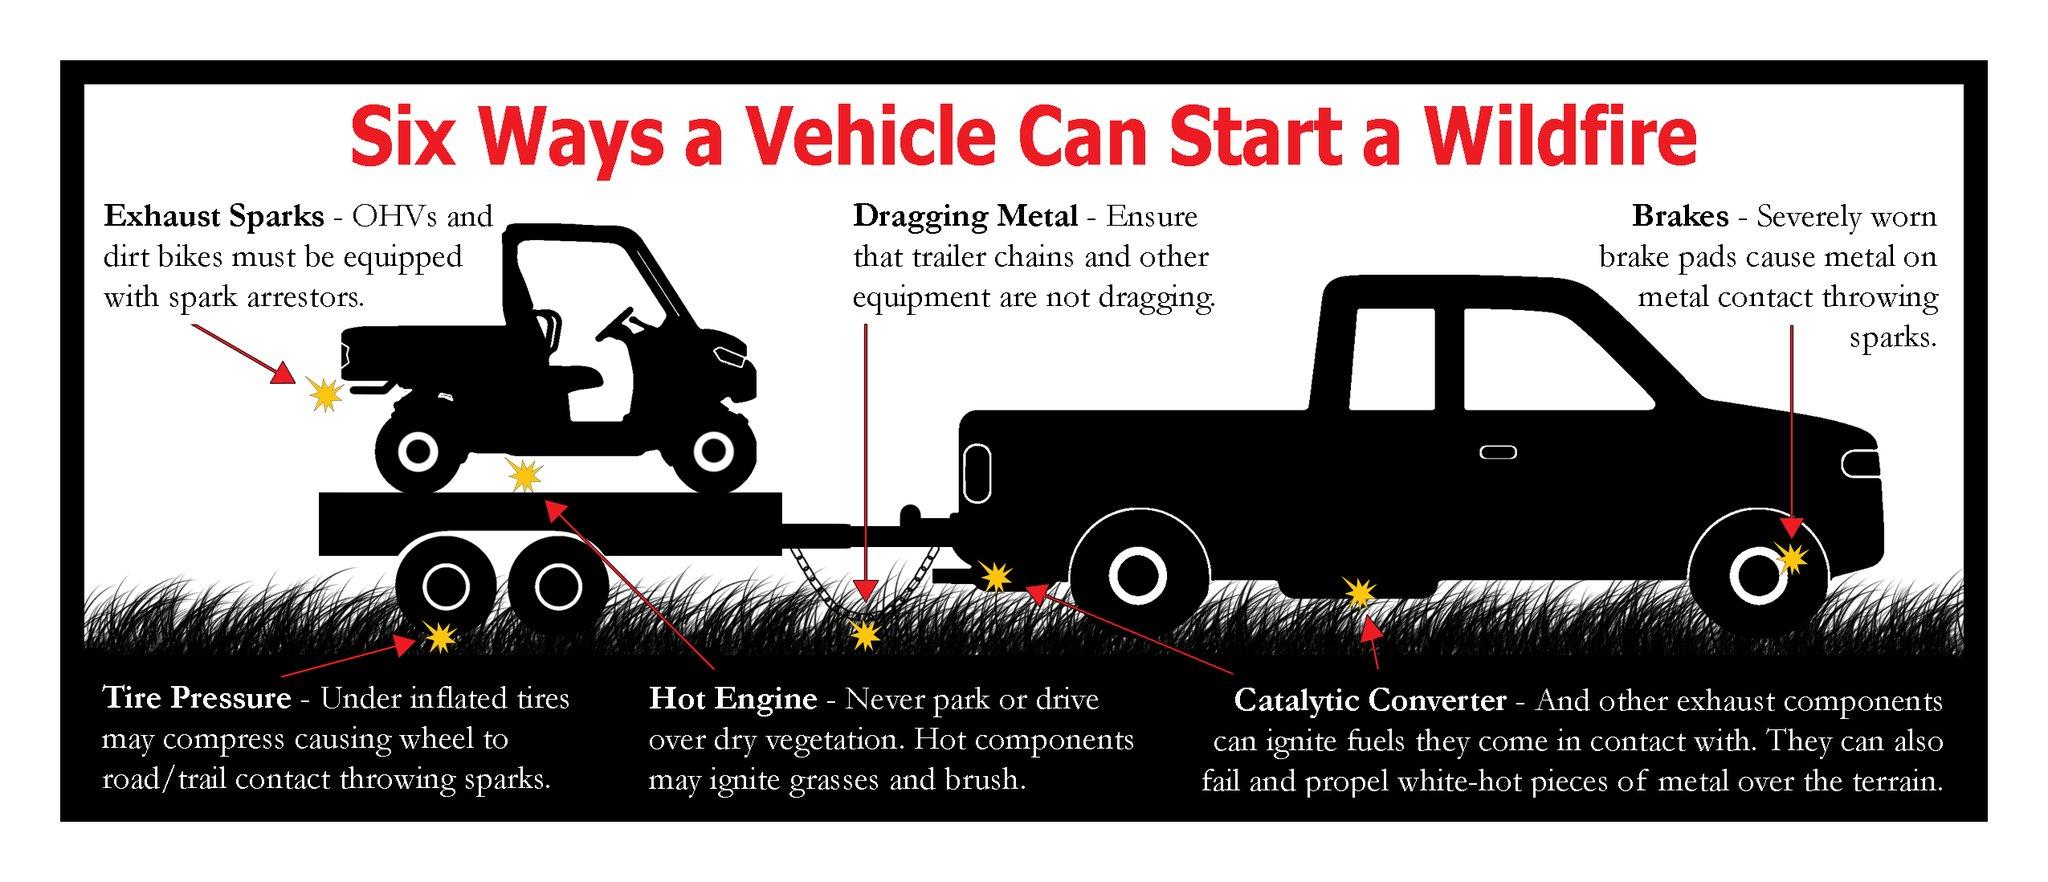 Six Ways Vehicles Start Wildfires